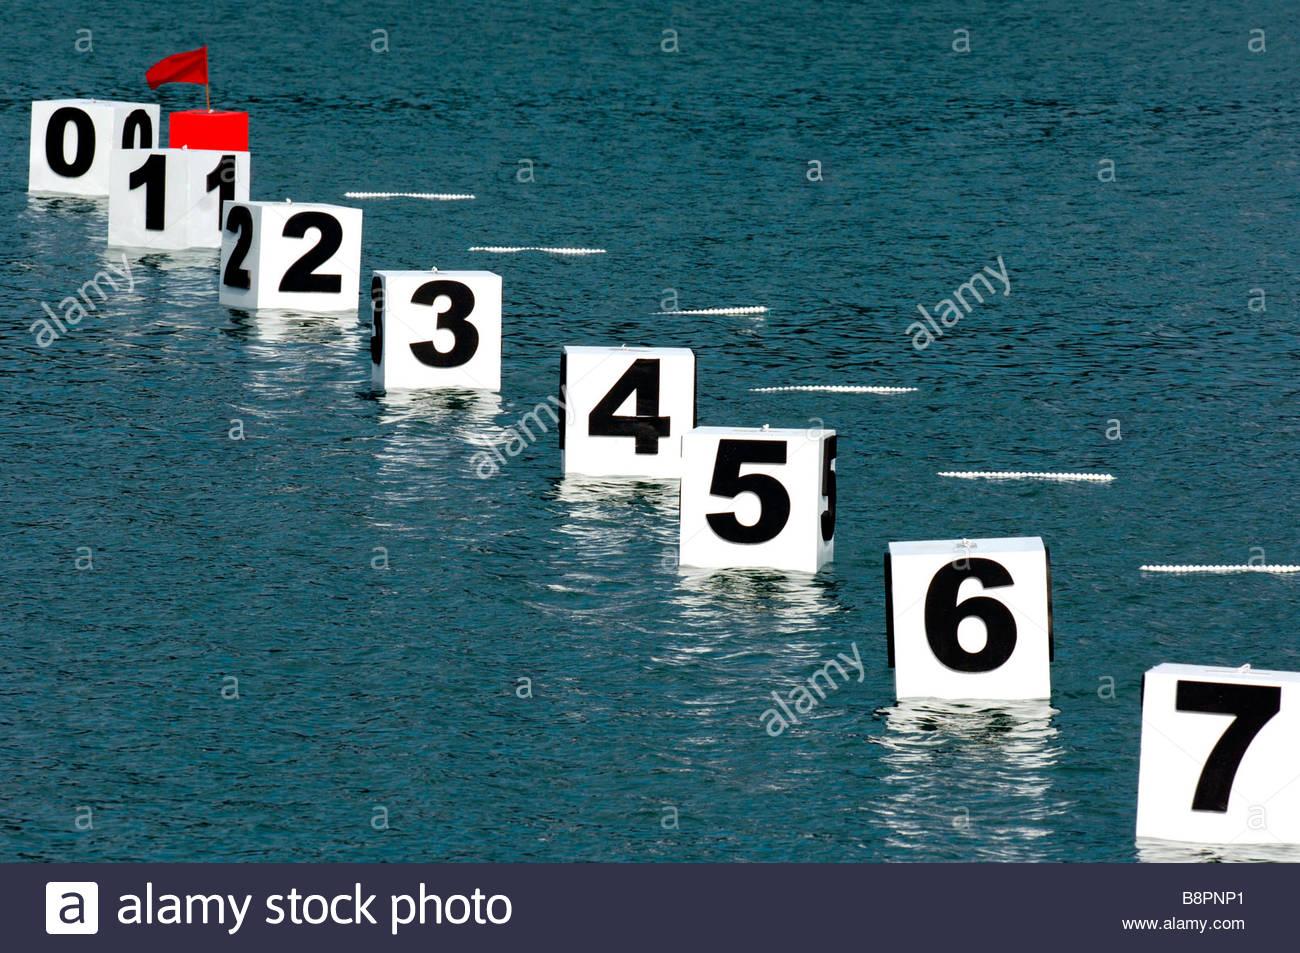 rowing - Stock Image